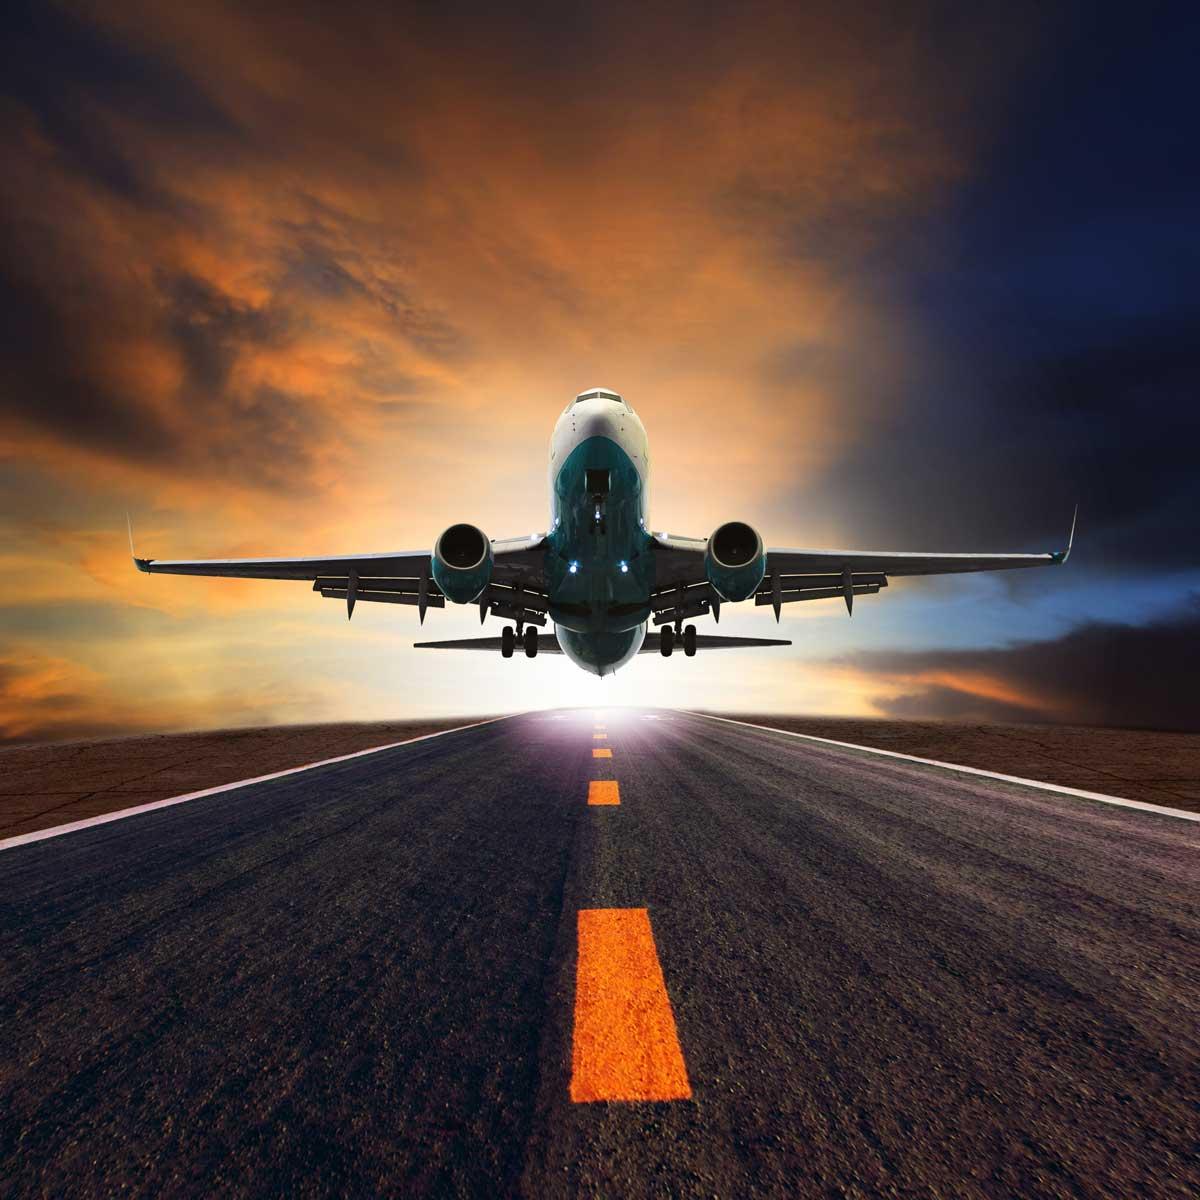 aircraft modification services stc twenty one avionic flight testing aircraft